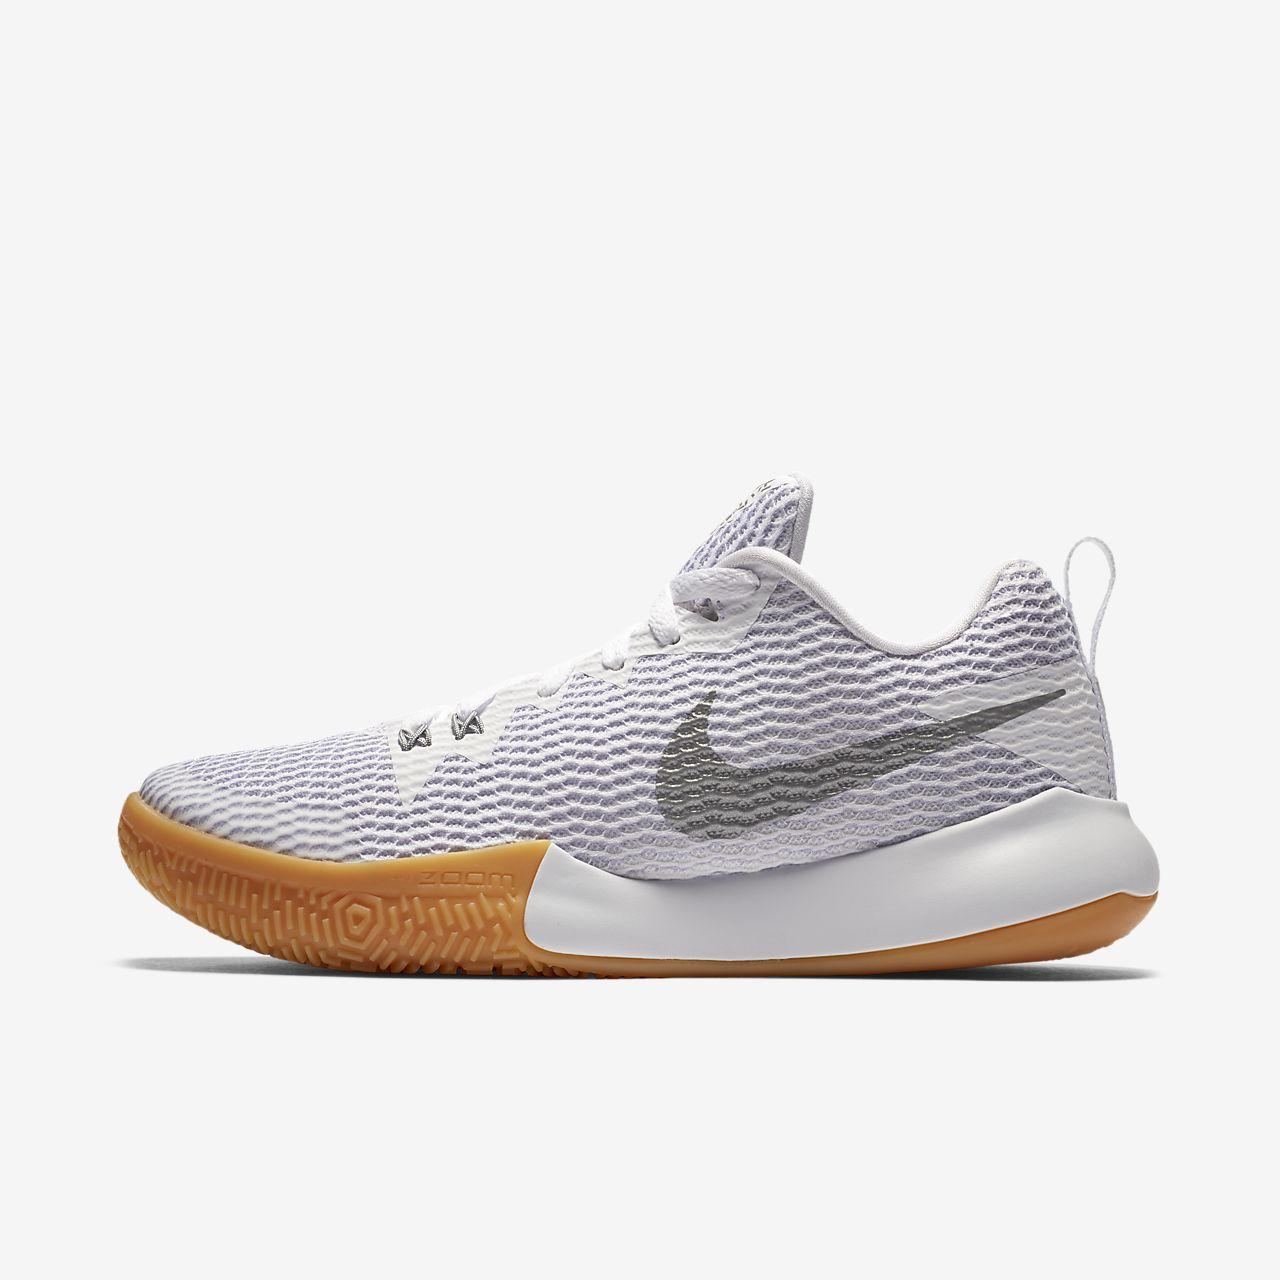 Chaussure de basketball Nike Zoom Live II pour Femme